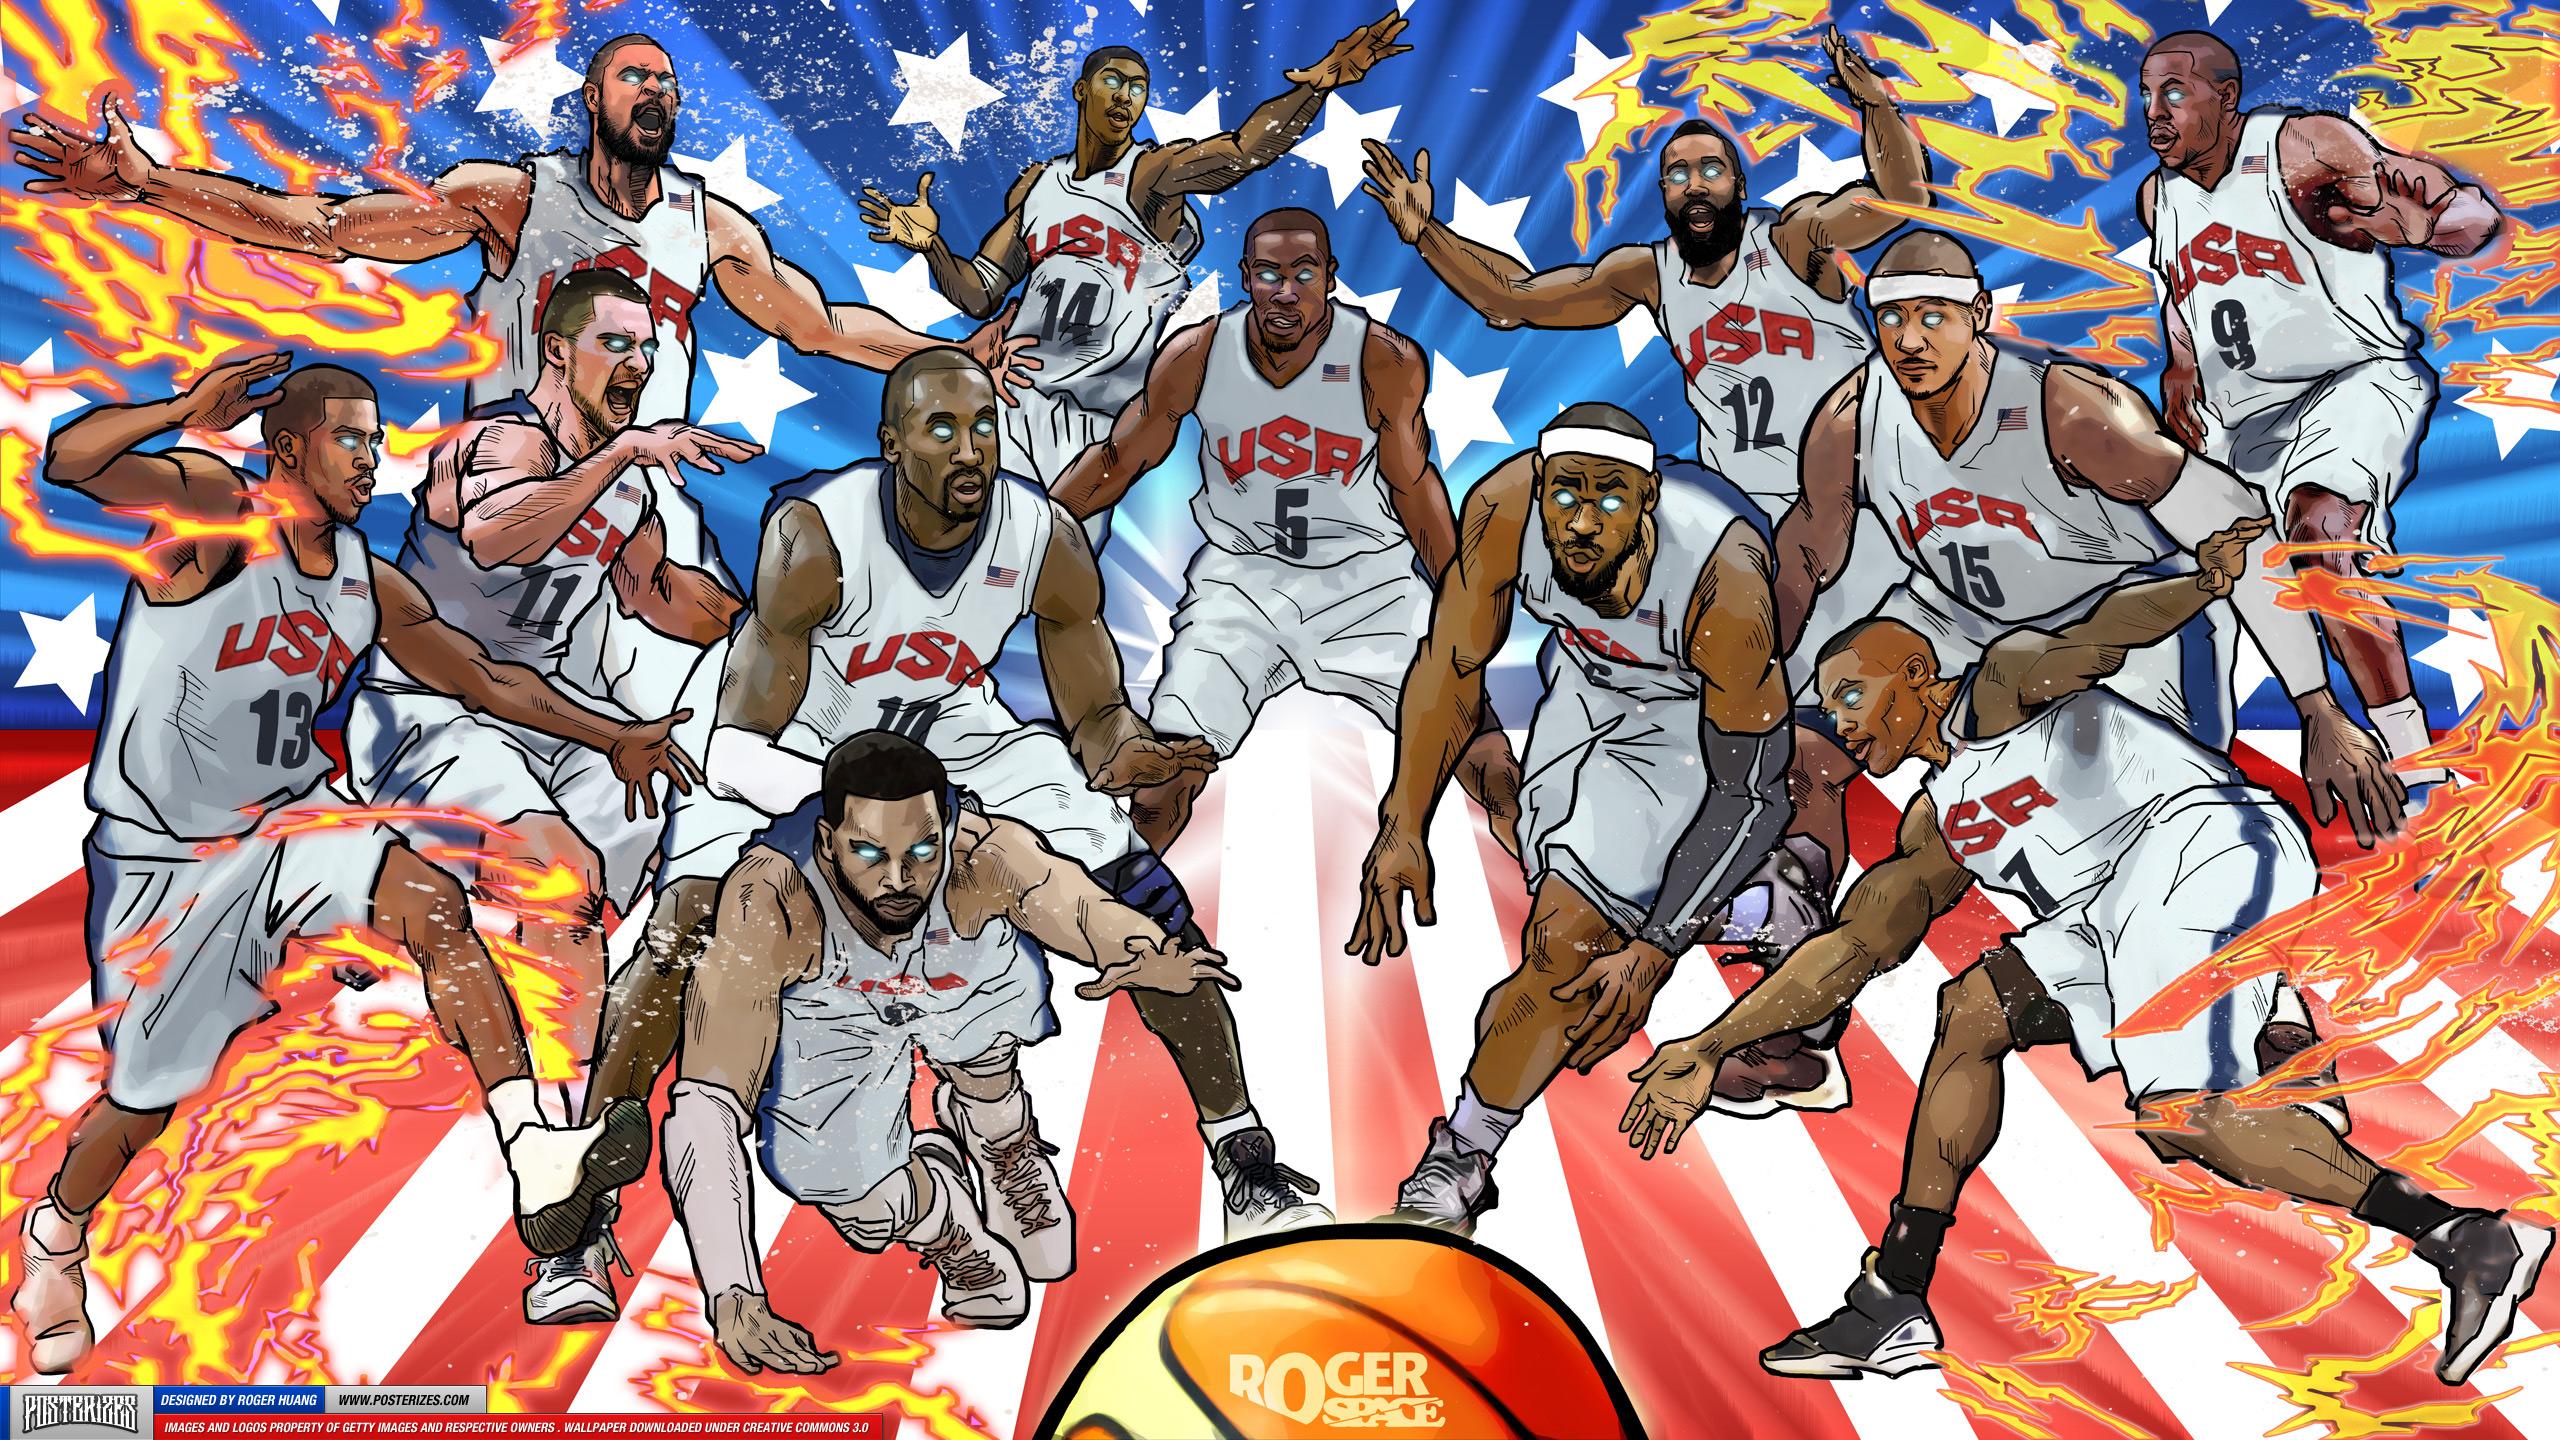 nba usa team nba team wallpaper share this cool nba basketball team 2560x1440